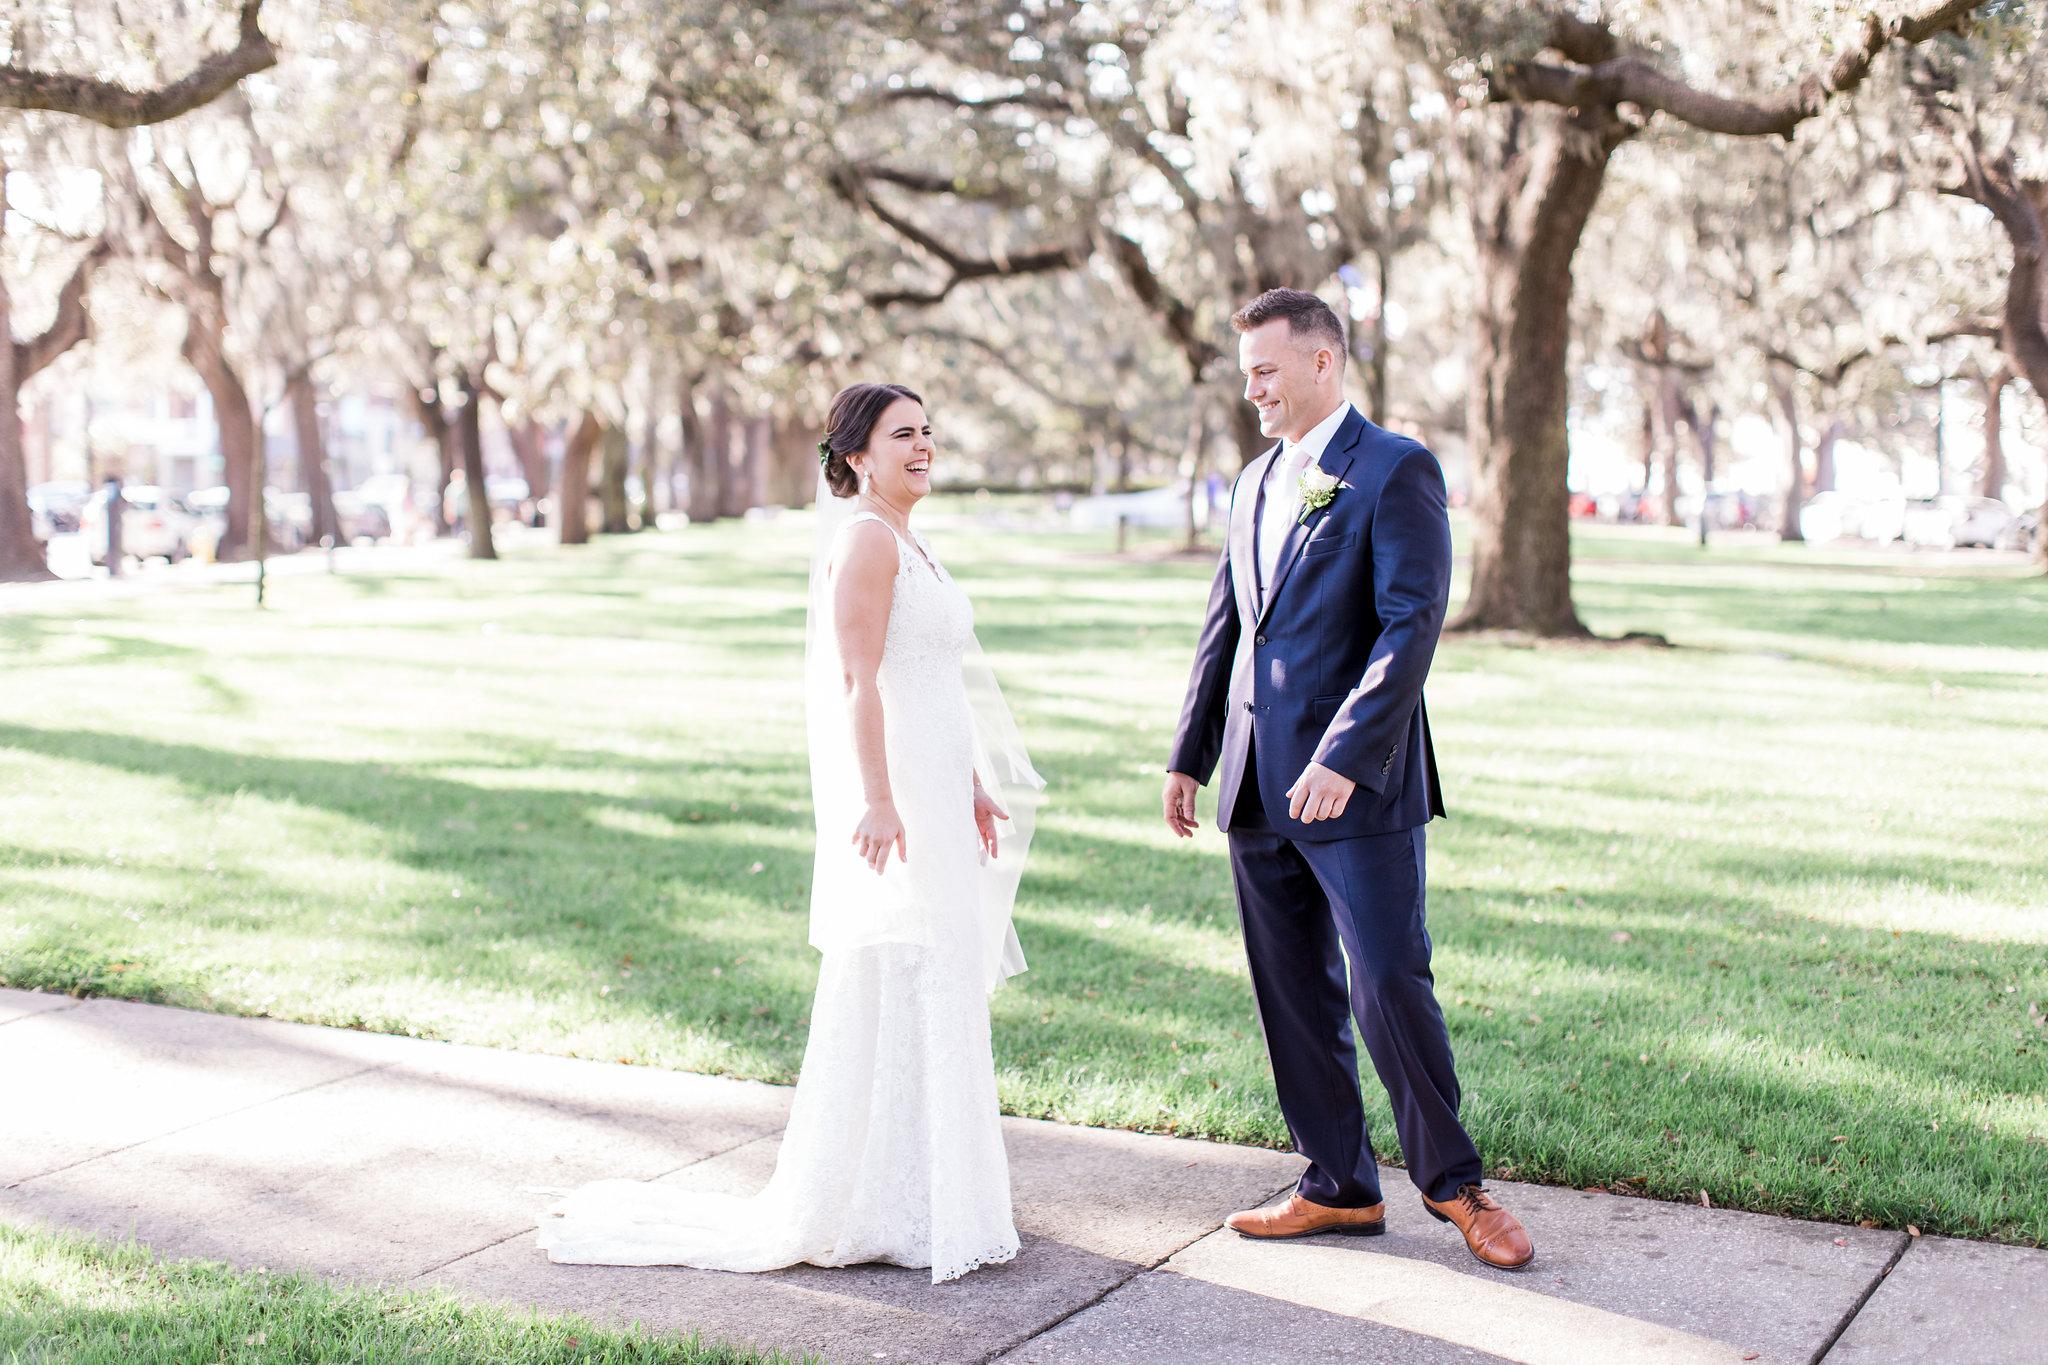 apt-b-photography-Savannah-wedding-photographer-savannah-engagement-photographer-historic-savannah-engagement-charles-h-morris-center-wedding-savannah-weddings-15.JPG